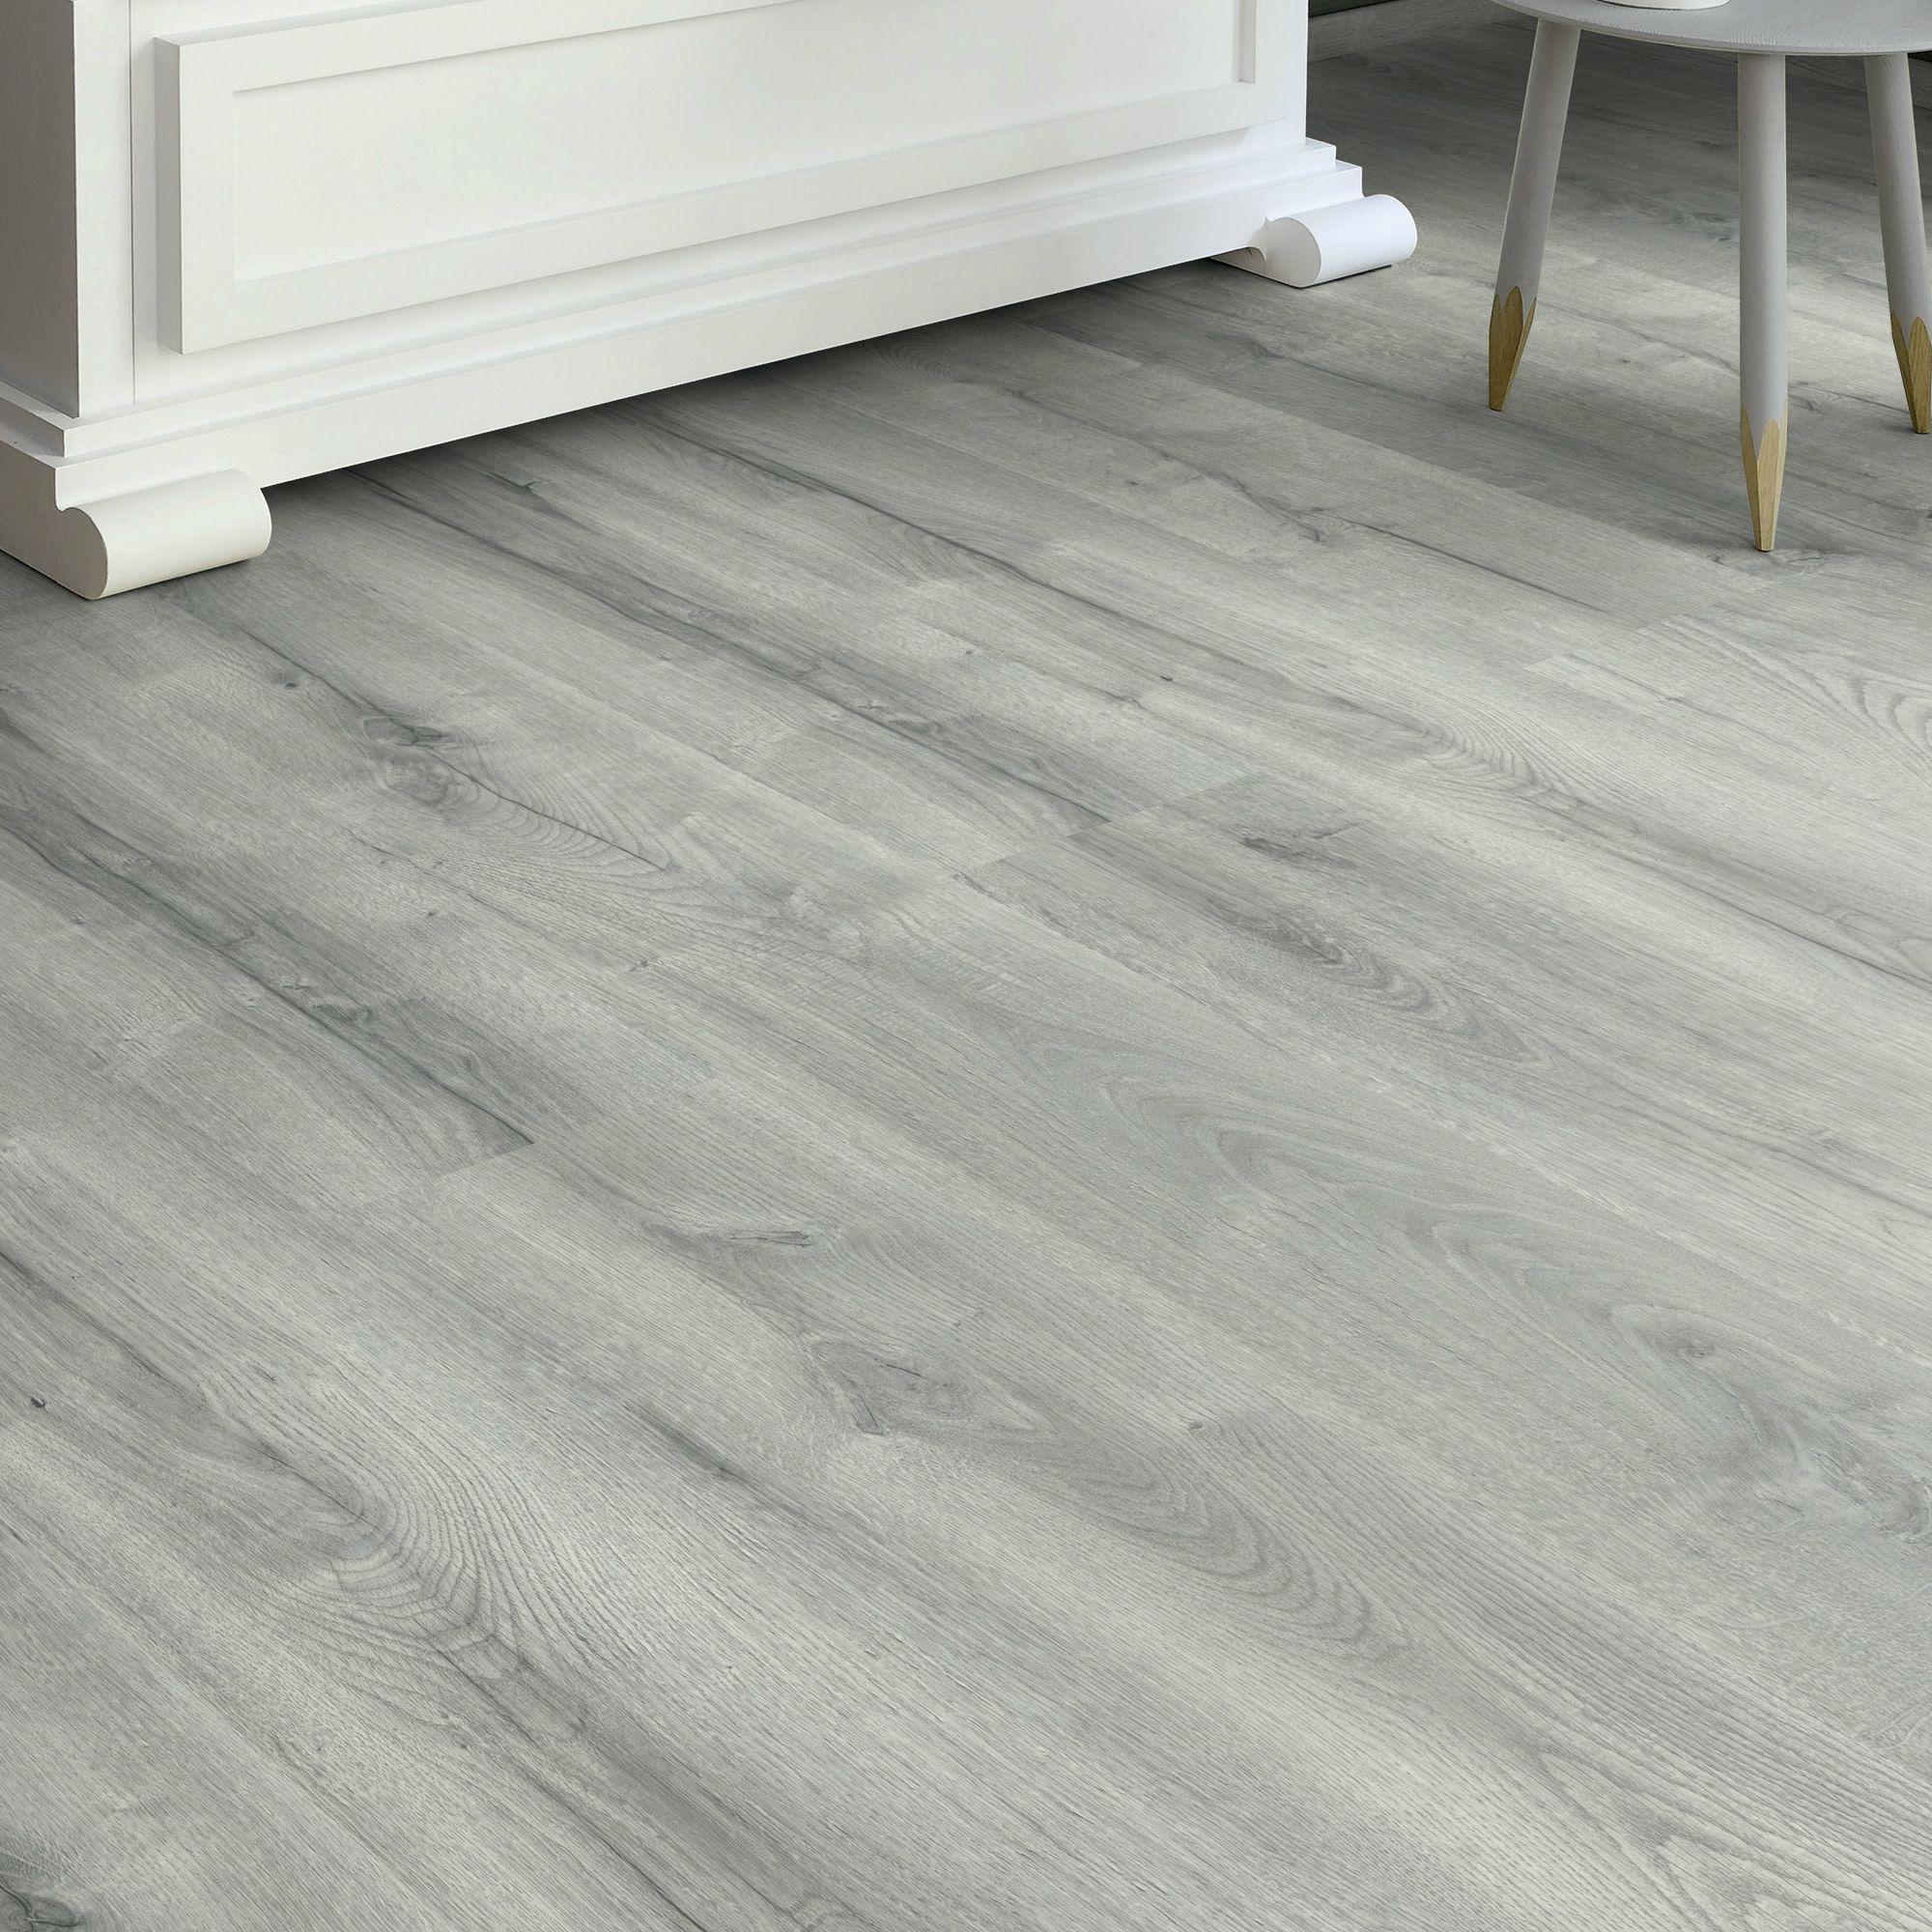 bathgate grey oak effect laminate flooring 214 m² pack